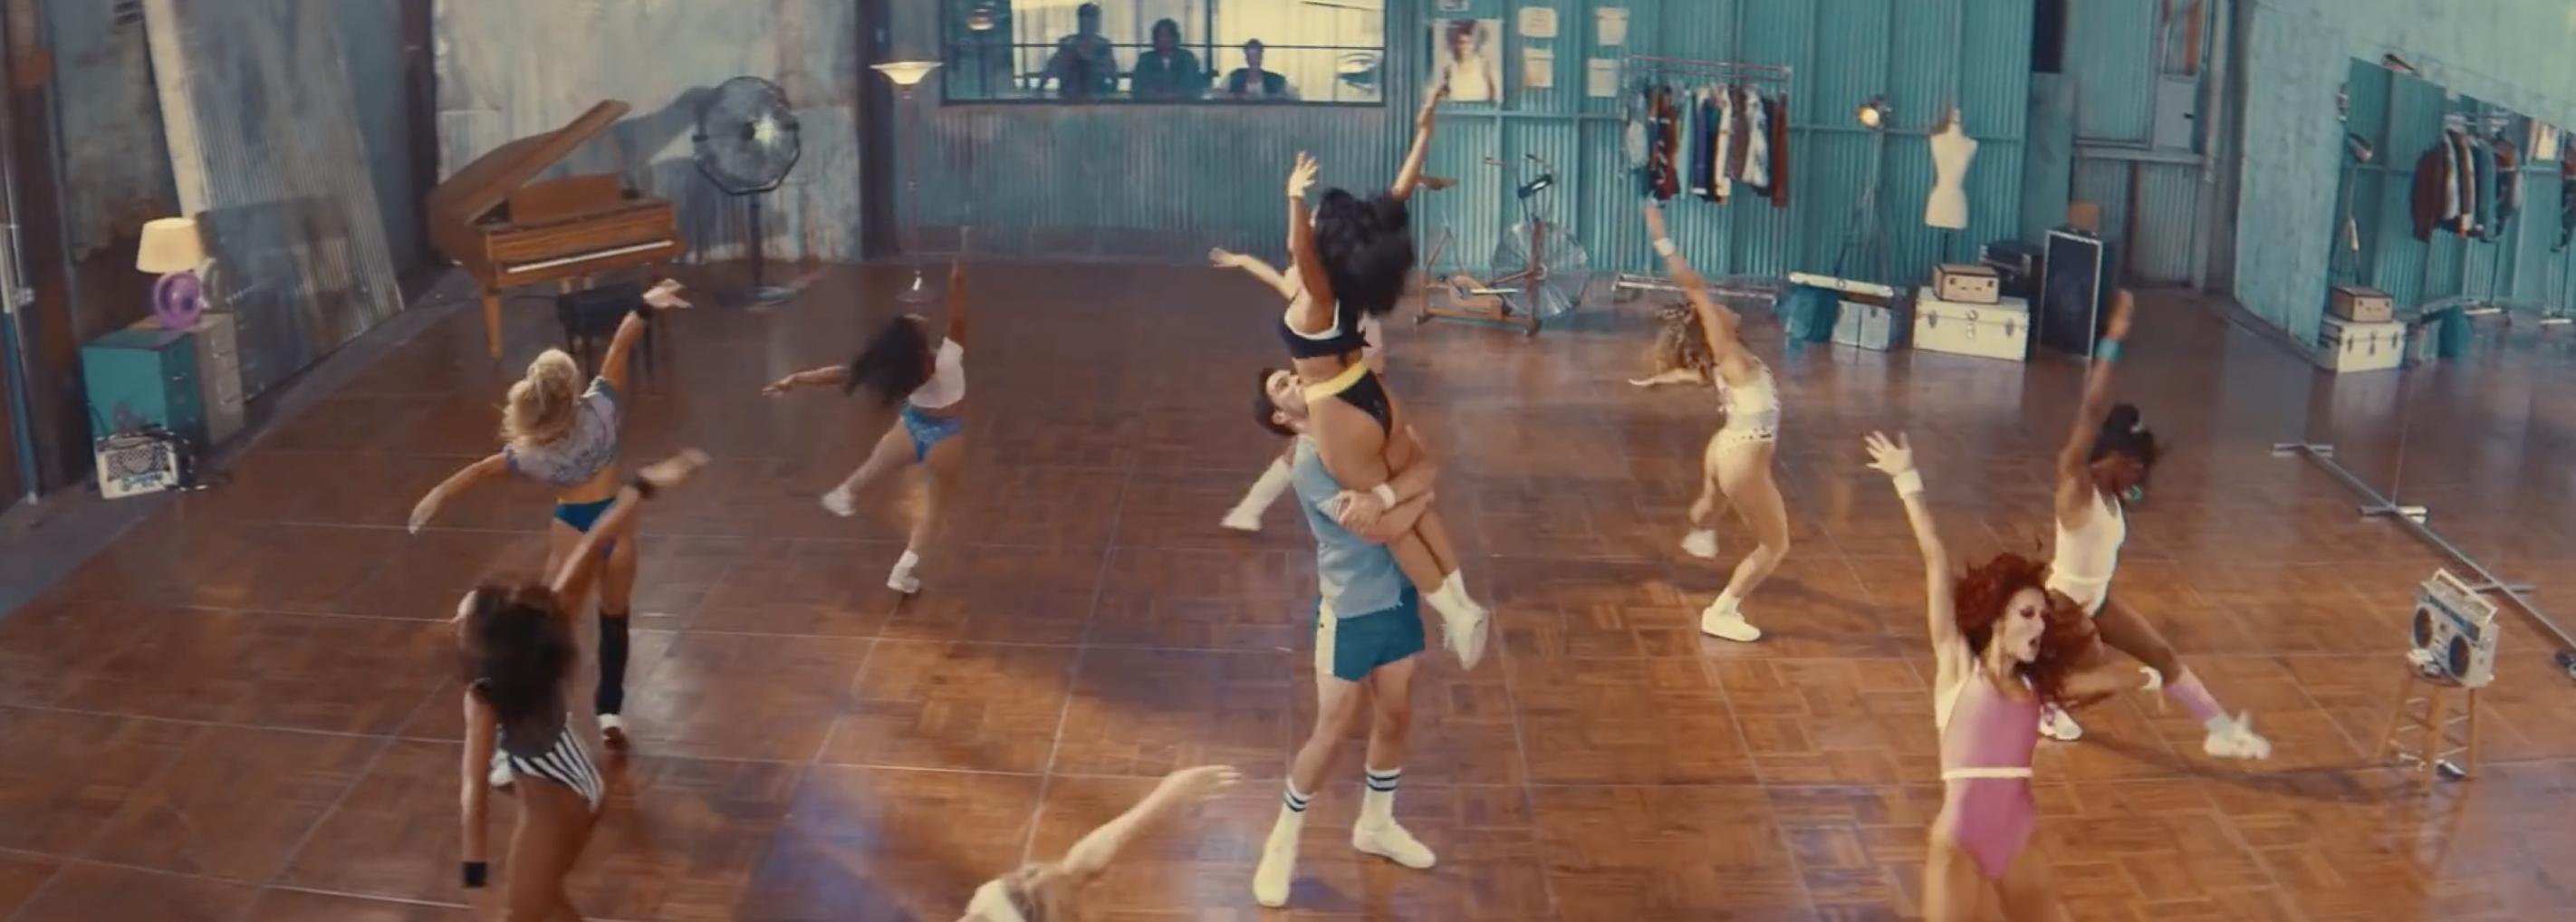 Clip - Kygo - Higher Love - Années 80 - Dirty Dancing